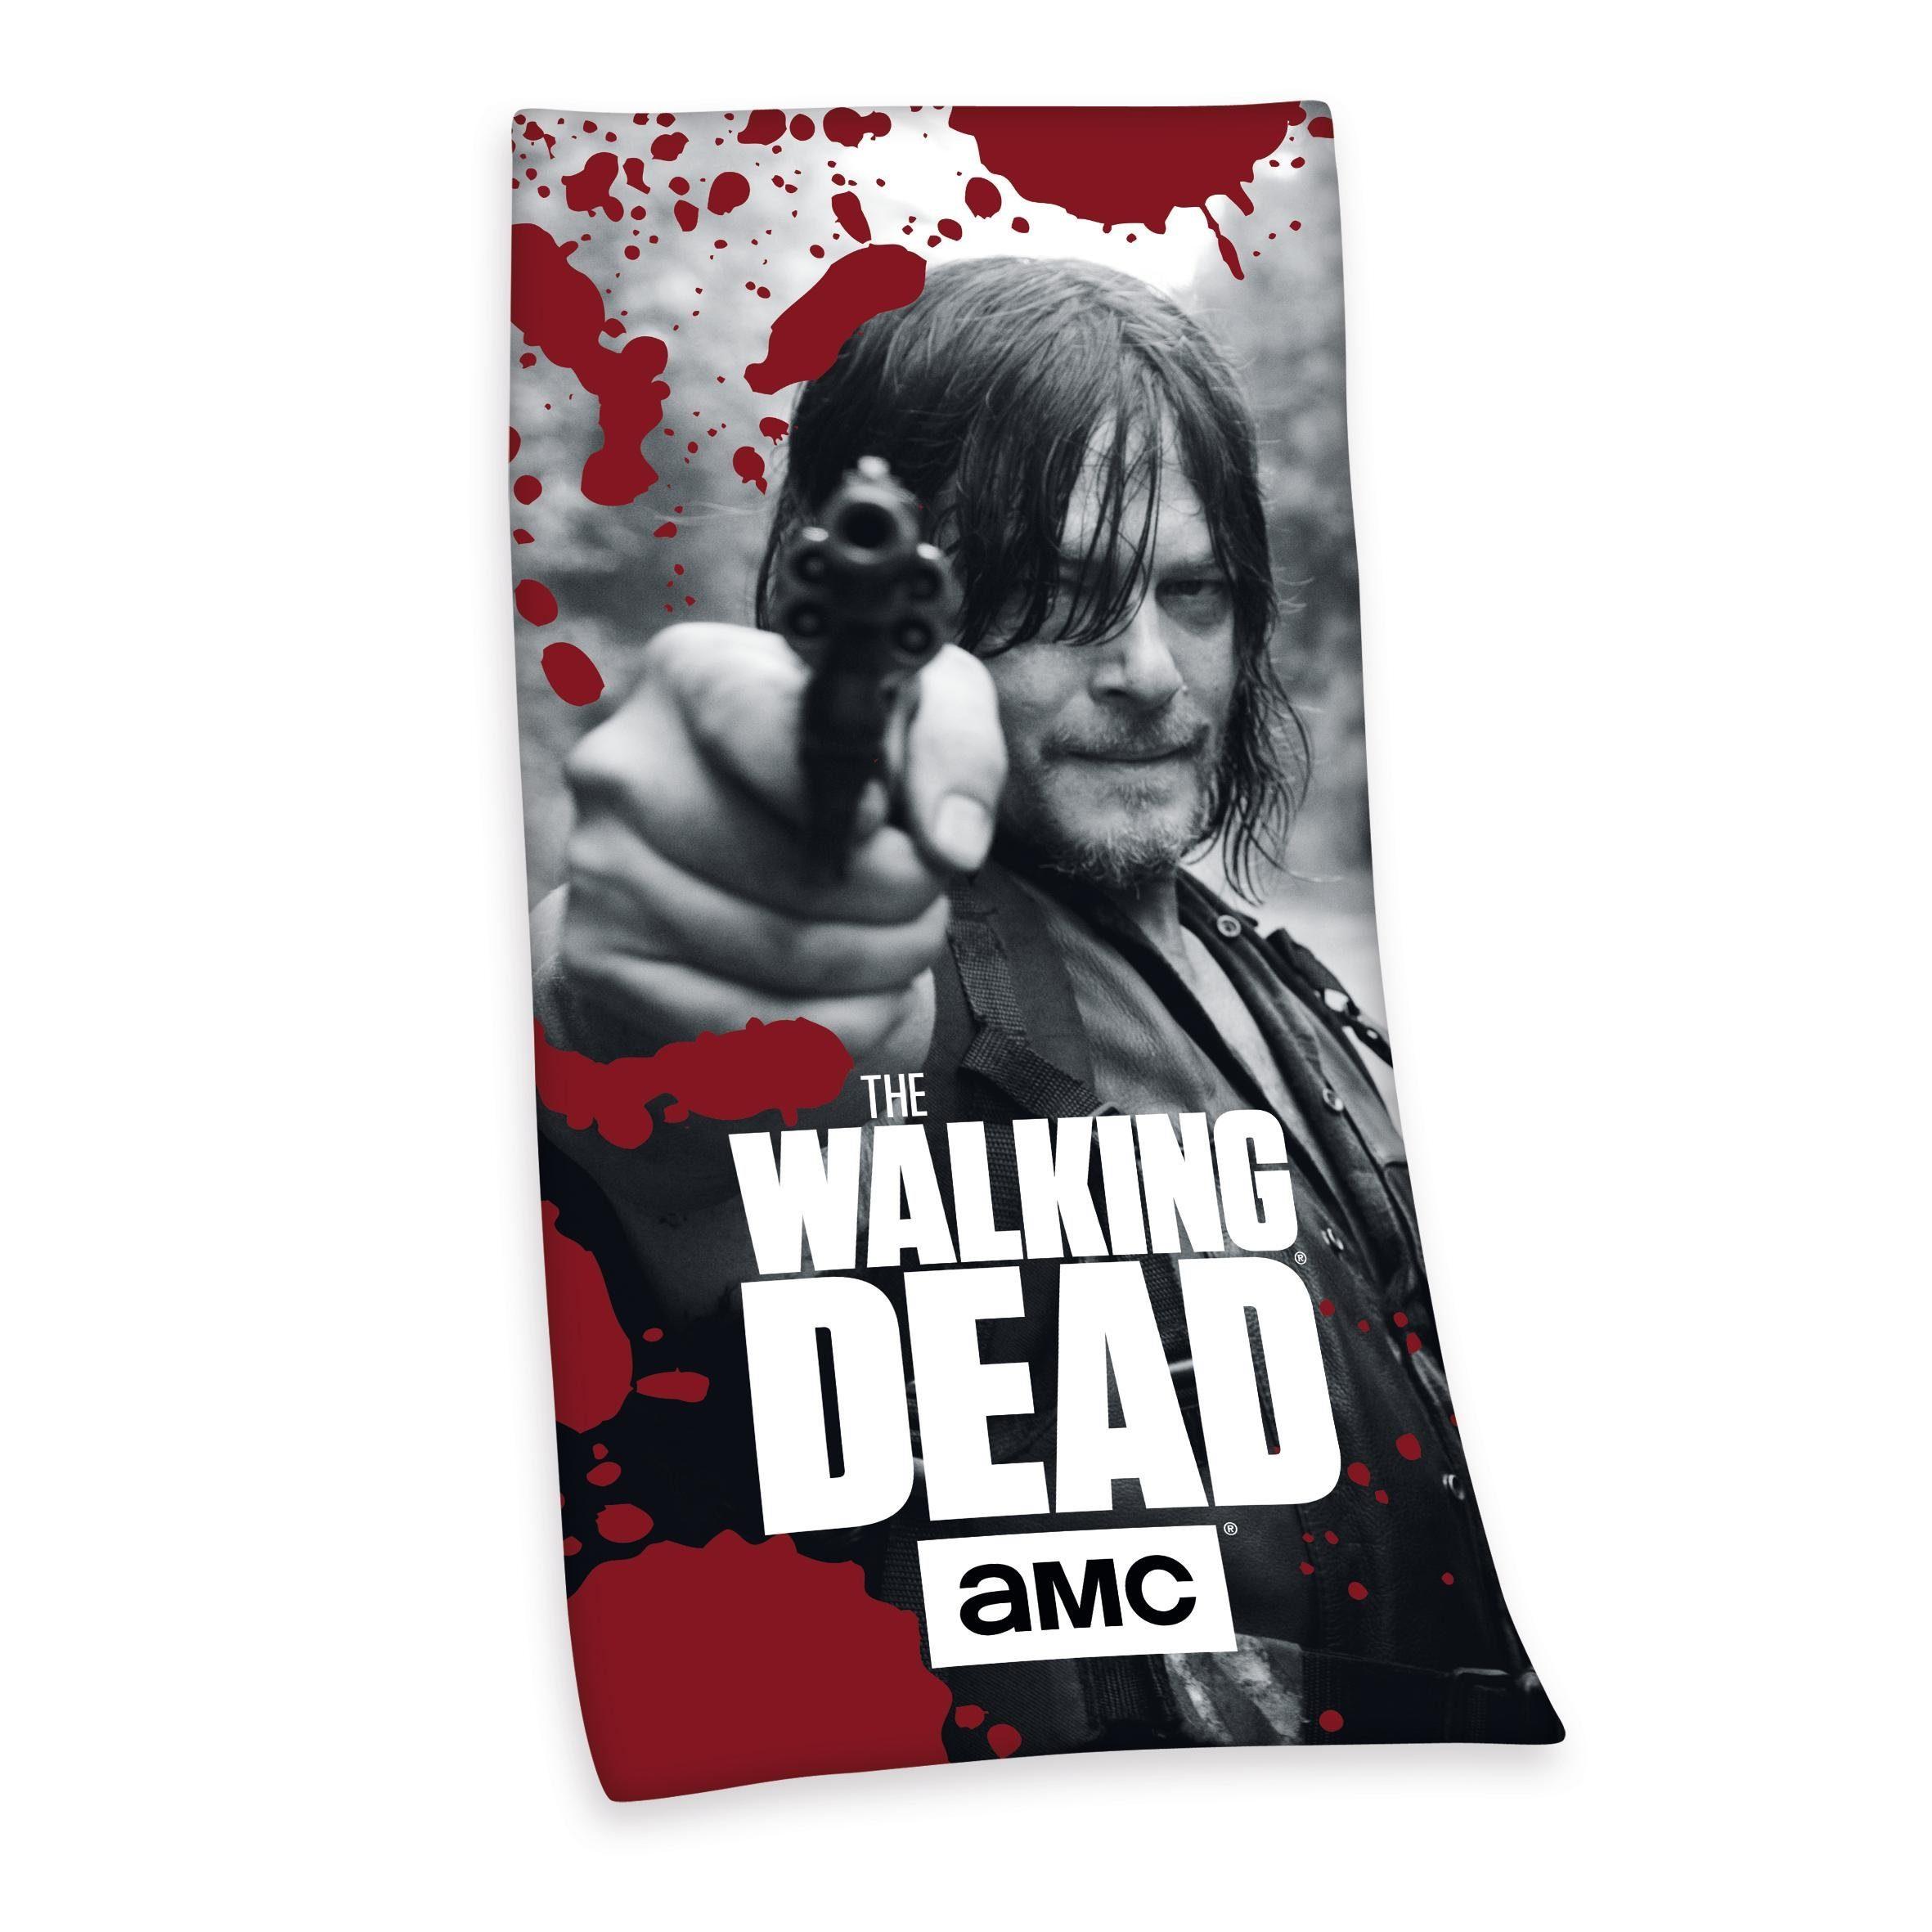 Badetuch, The walking dead, »Daryl Dixon«, in Schussposition